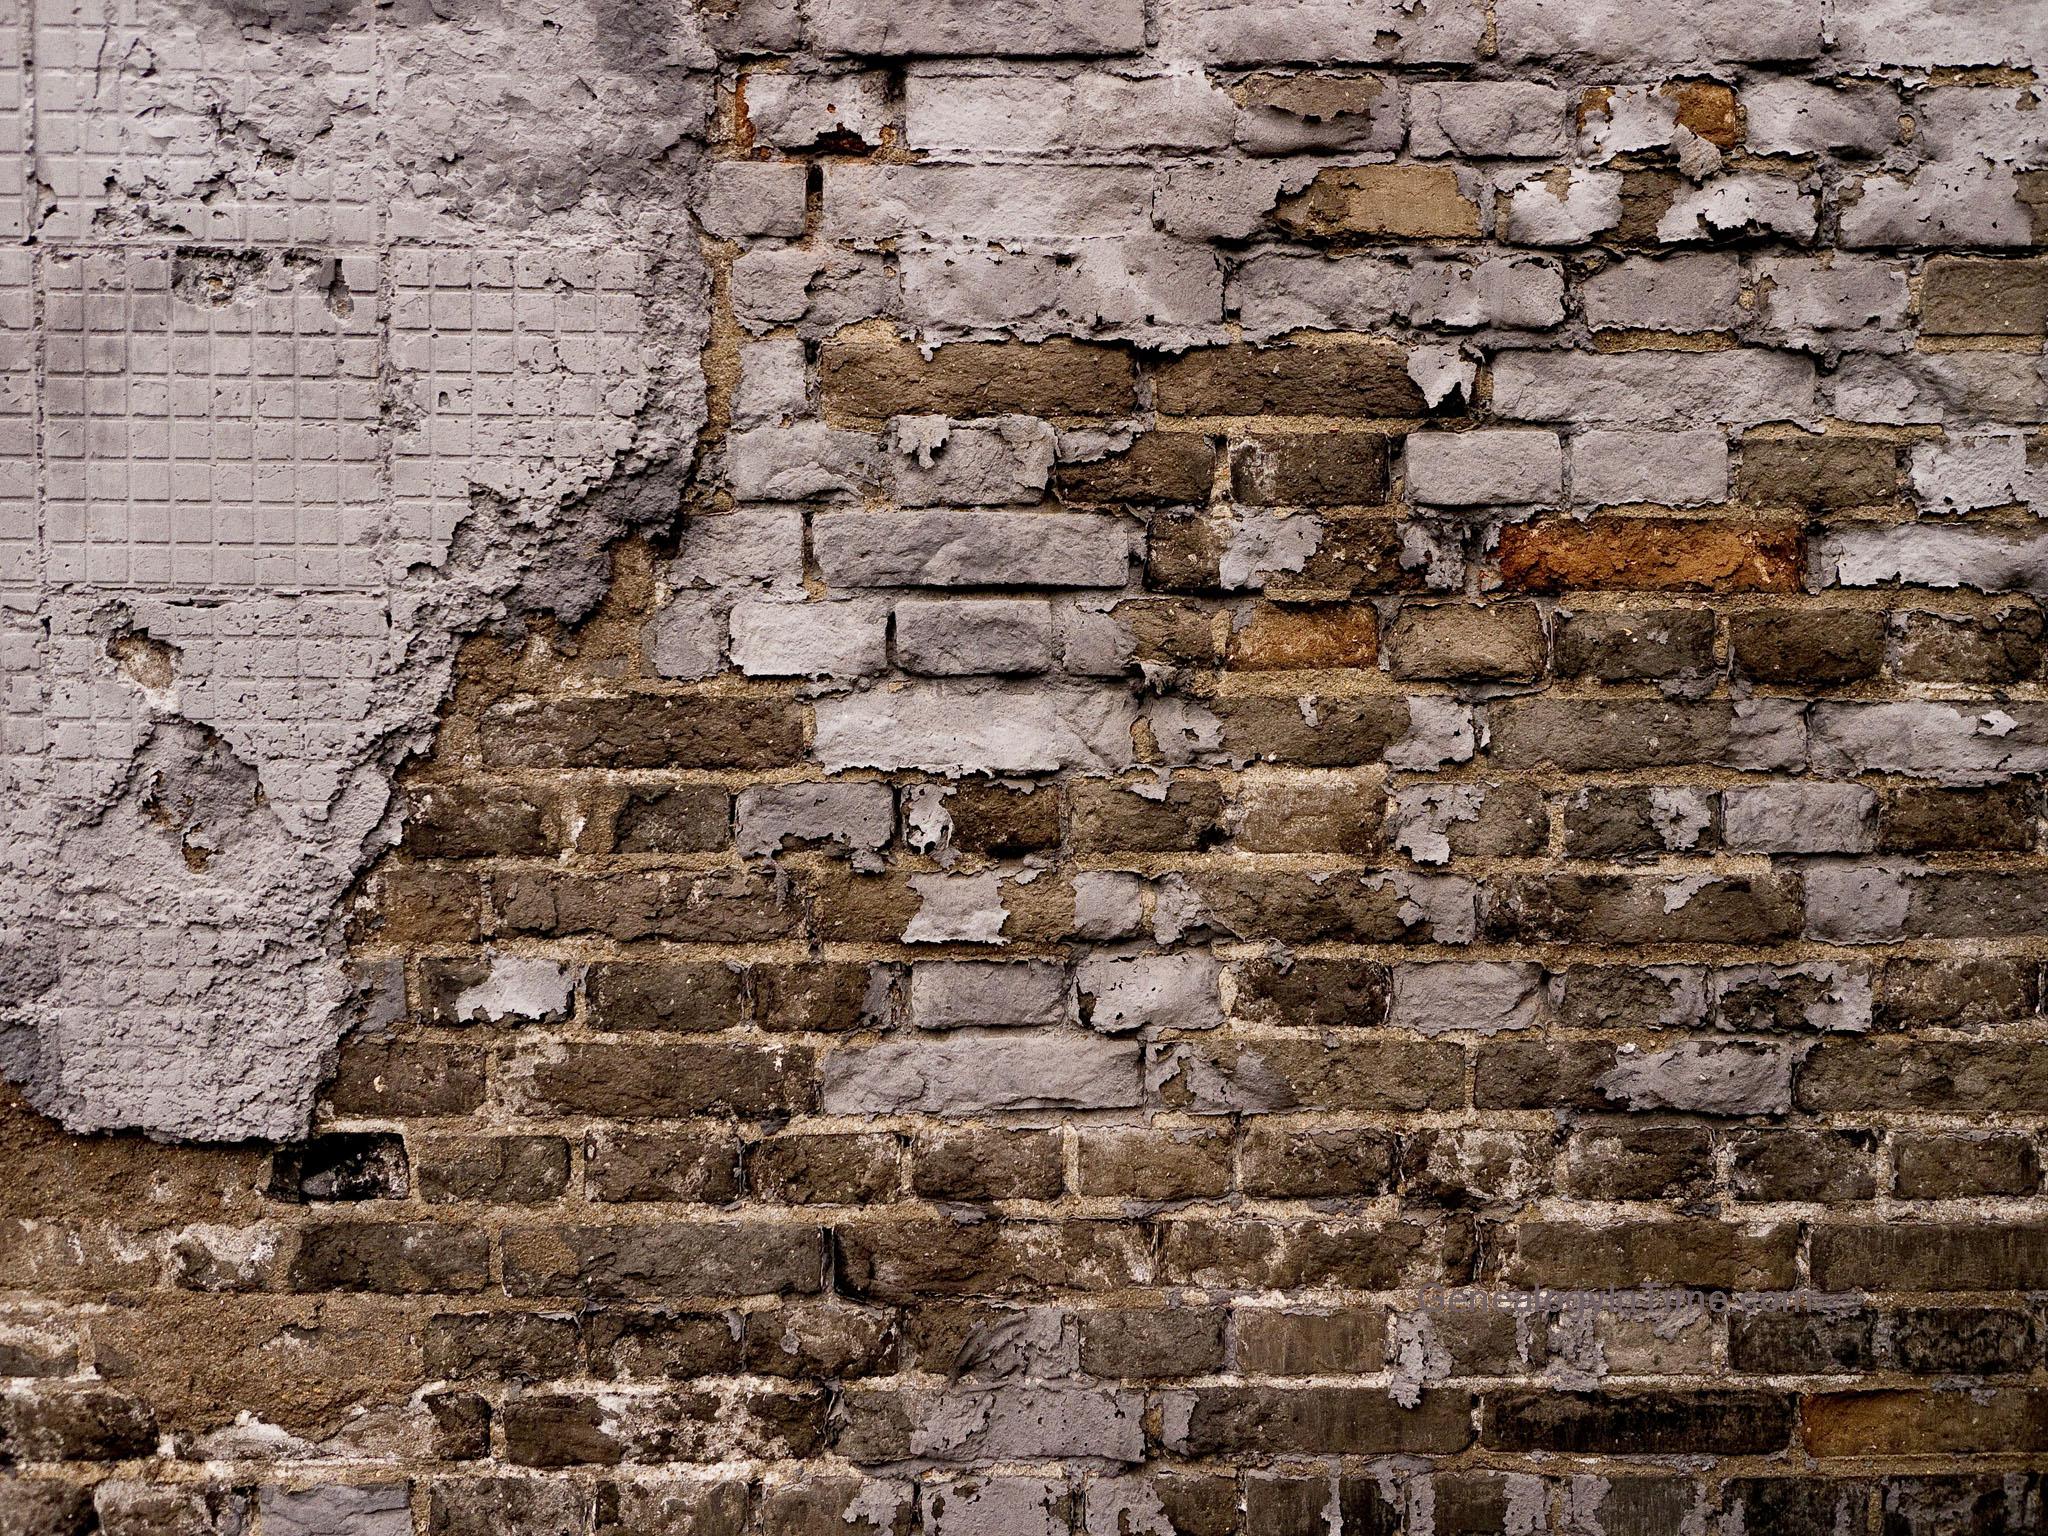 wp-content/uploads/2015/03/10-derelict-brick-wall.jpg